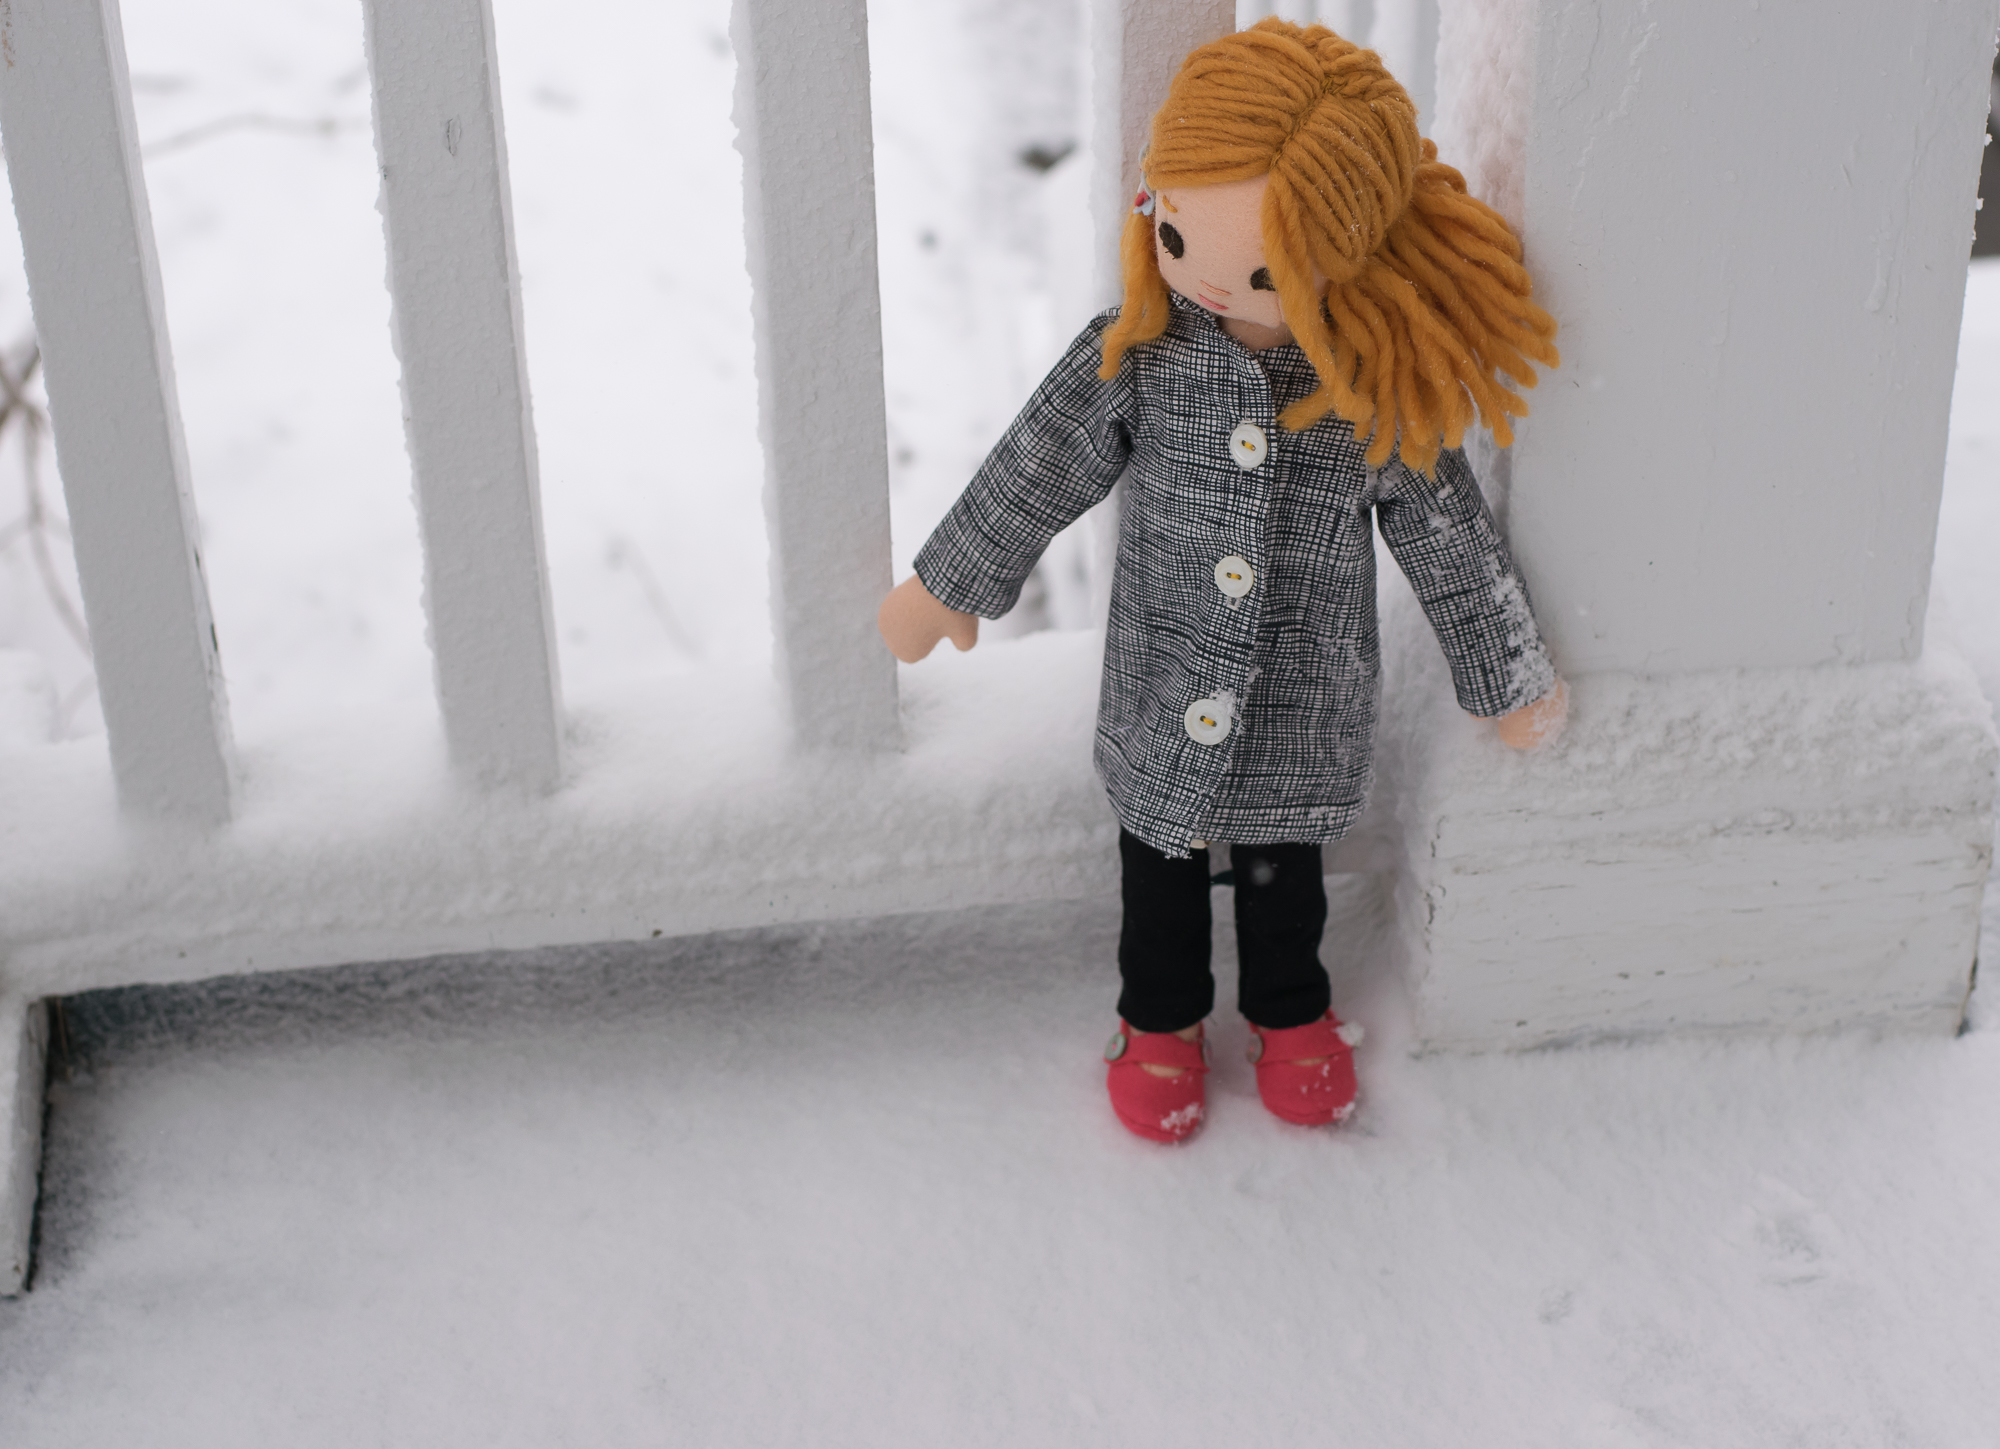 Gallery of Dolls-34.jpg